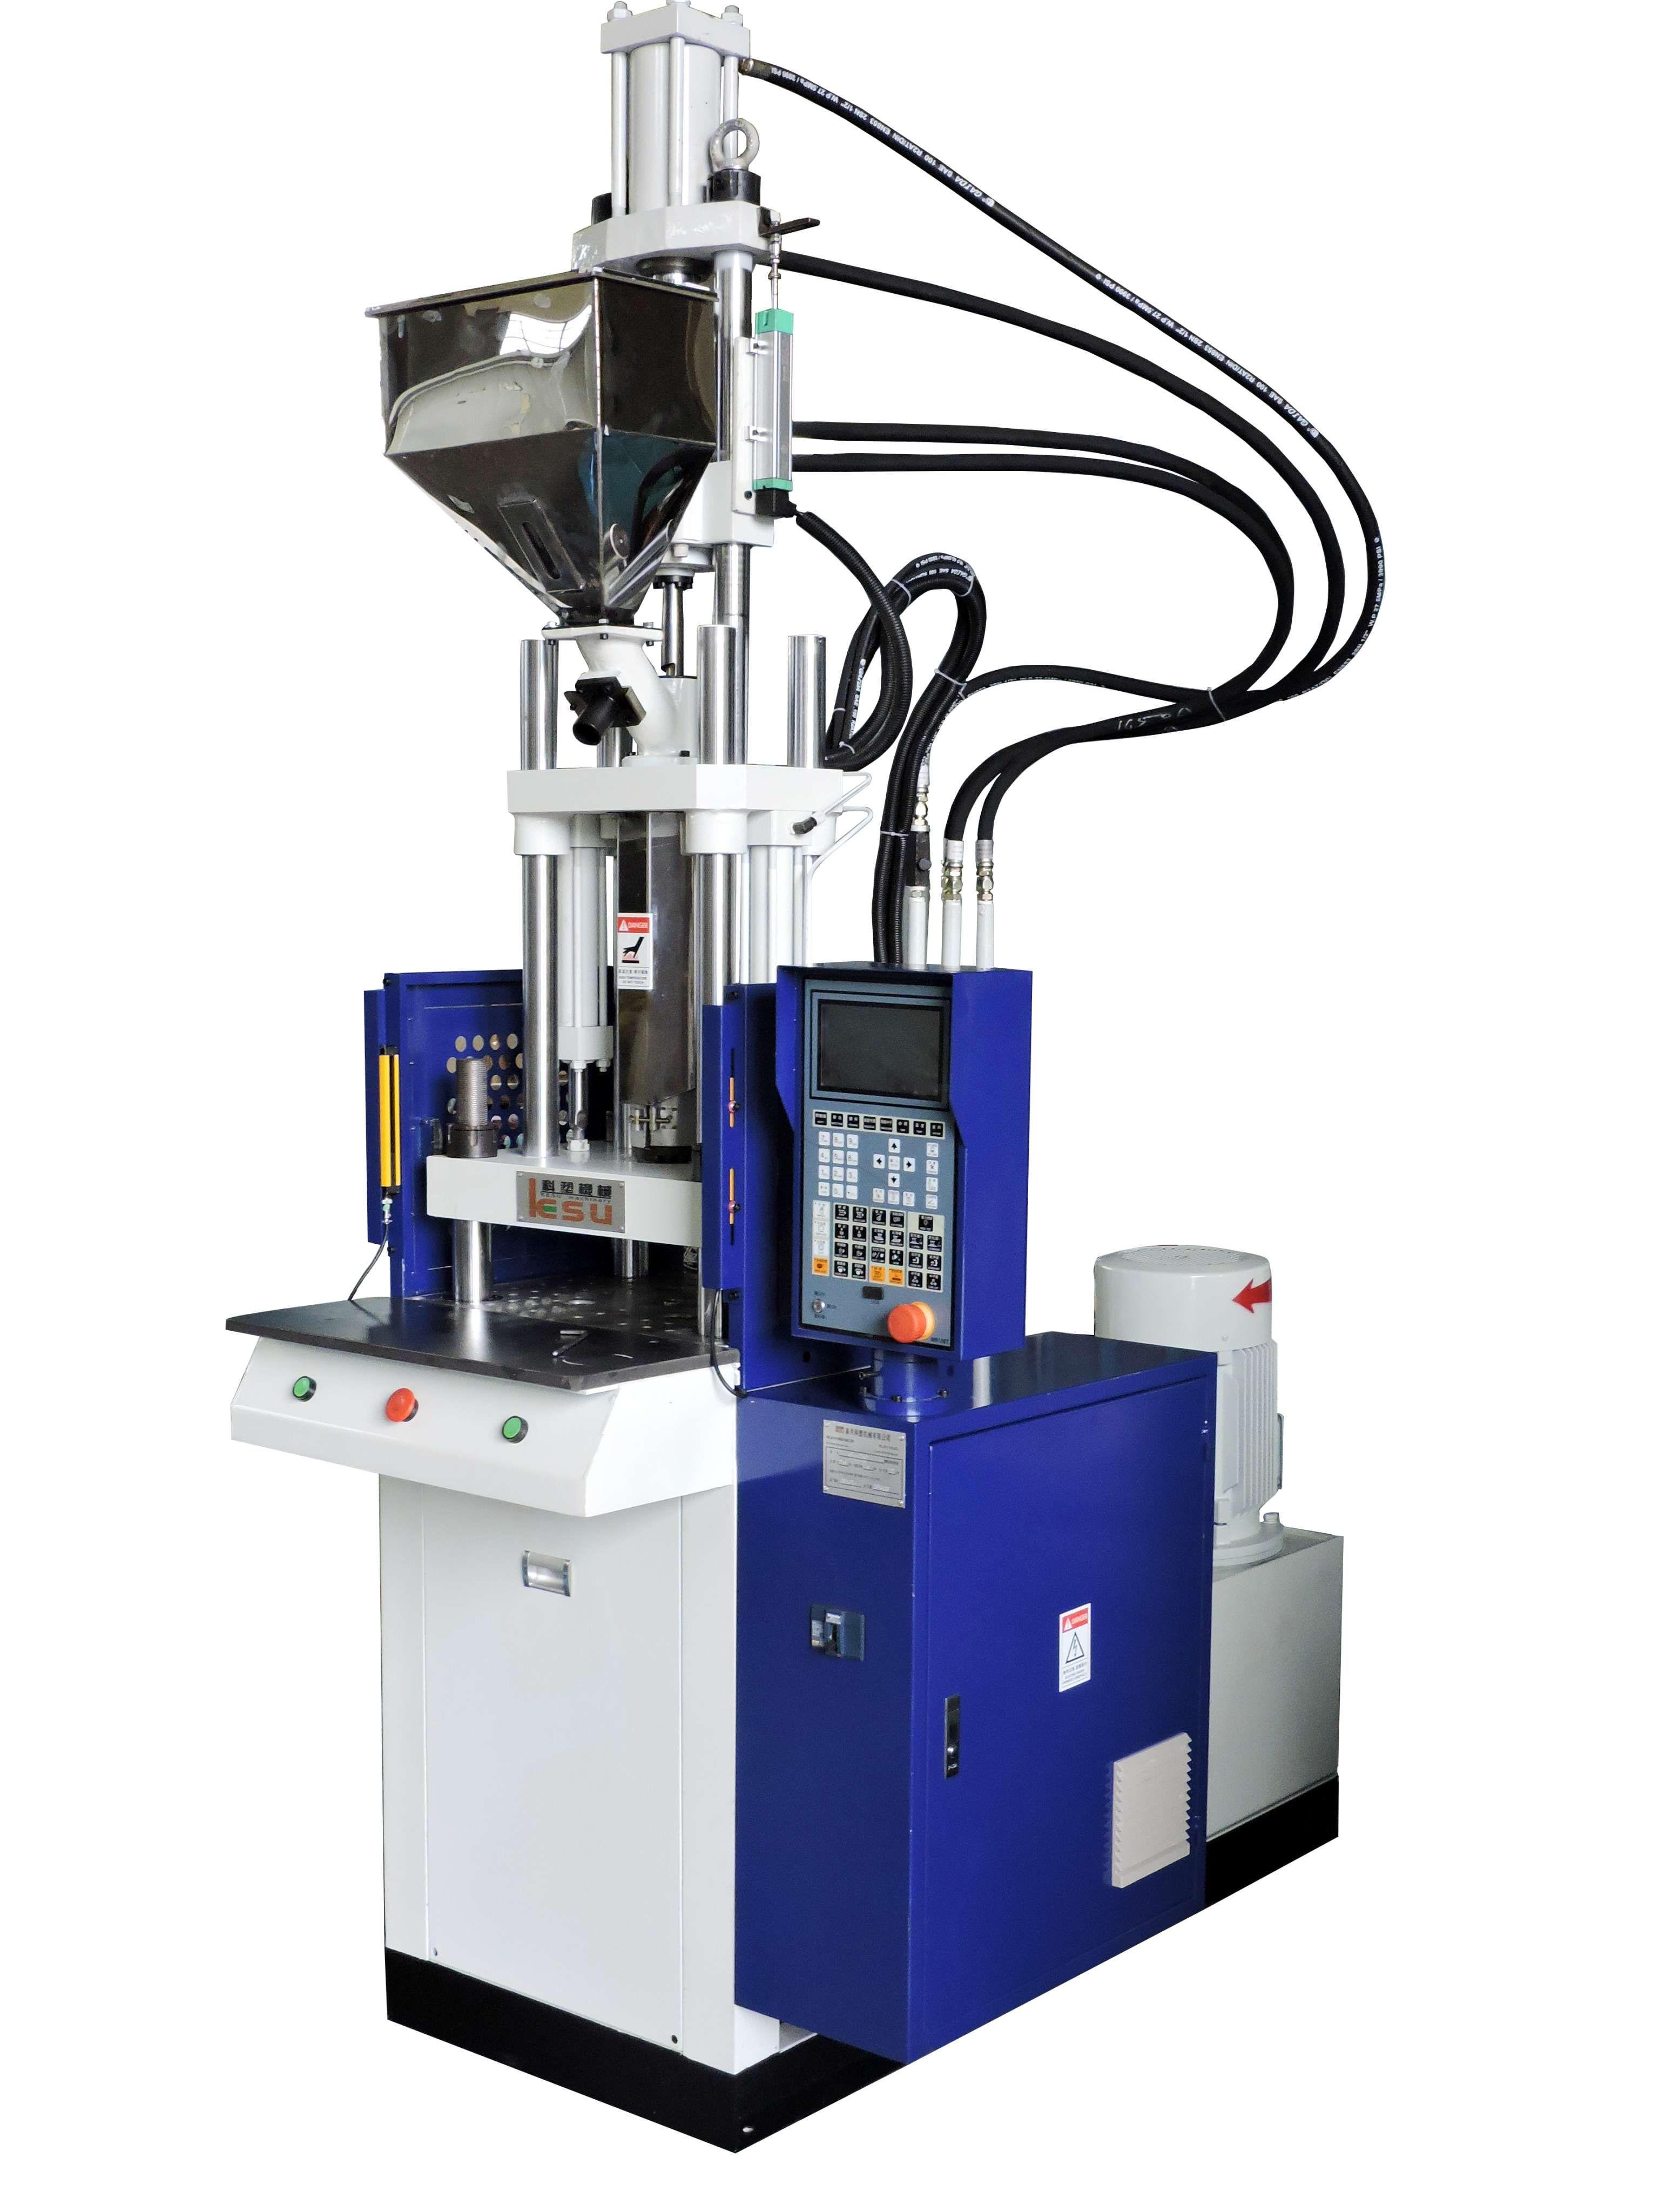 KS-250实验注塑机 立式滑板机 硅胶注射机 快速开合模立式注塑机